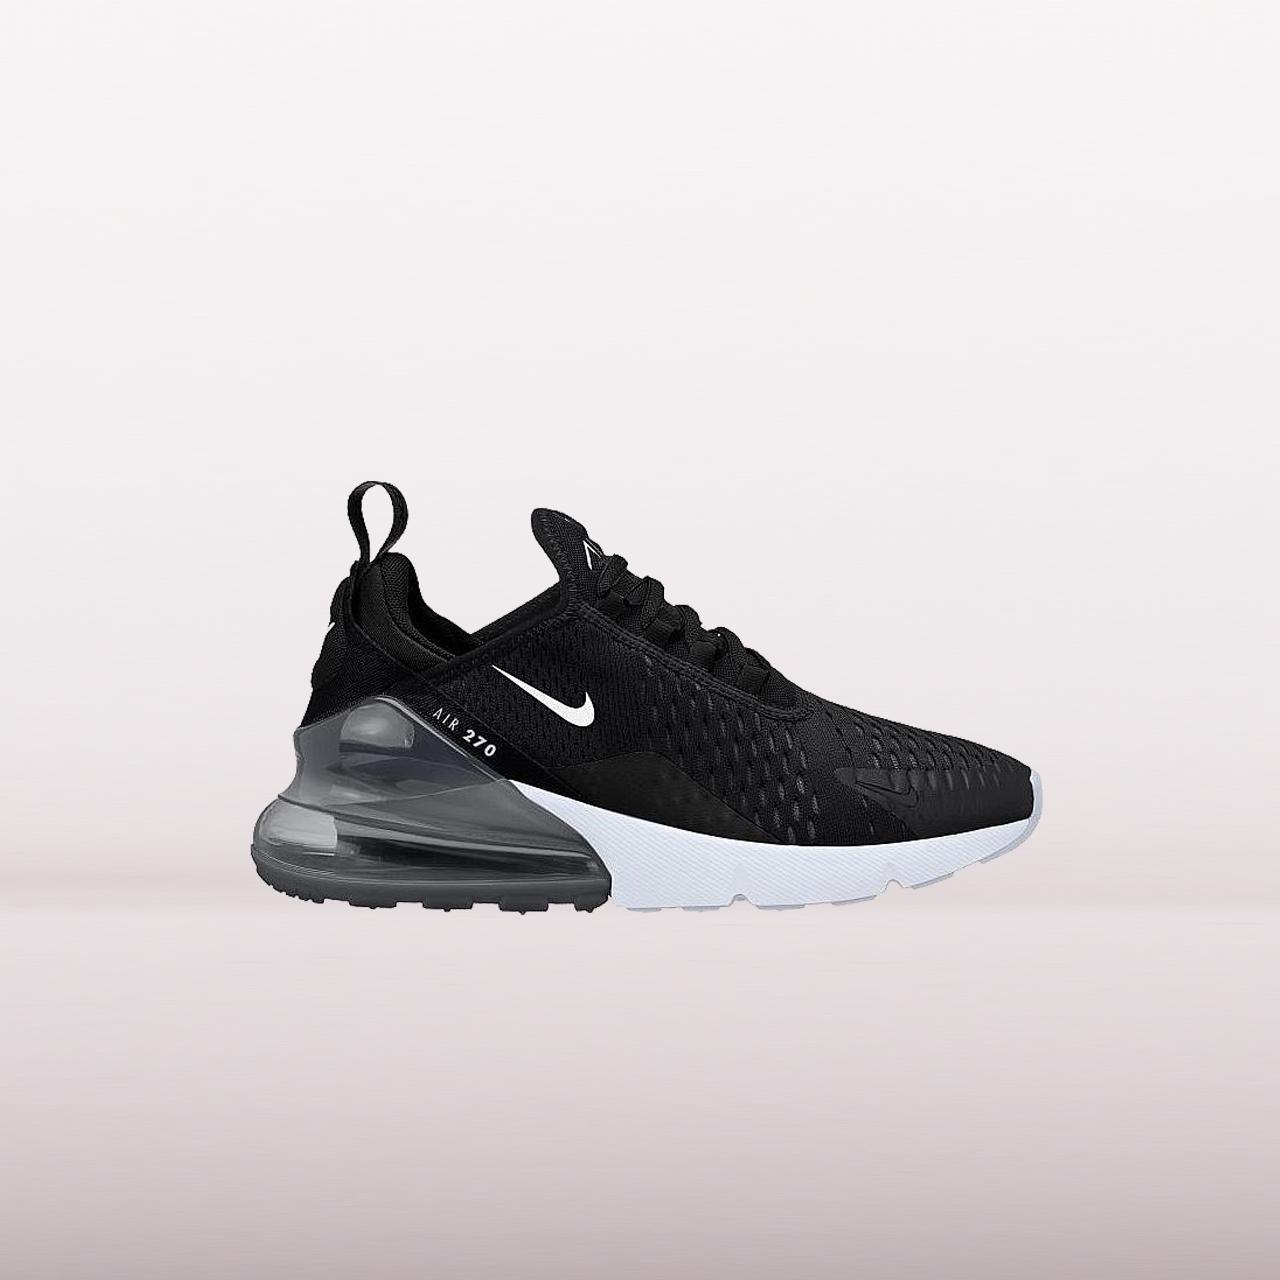 Nike Air Max 270 (Gs) Shoes Black Kids   eBay